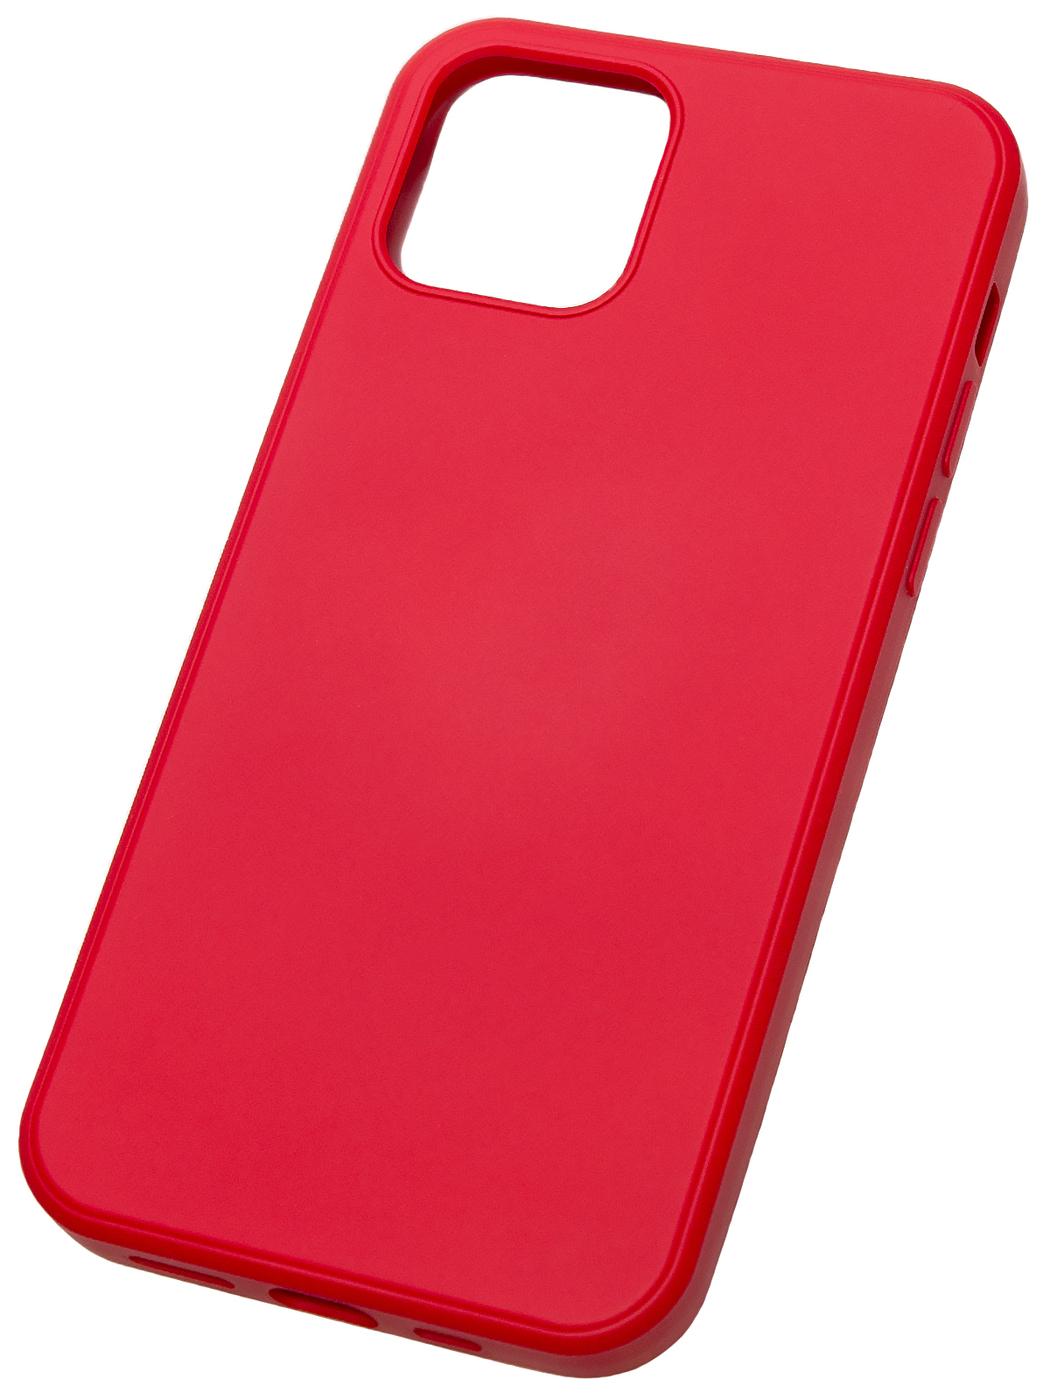 Чехол для Iphone 12 и Iphone 12 PRO/ Чехол для Айфон 12 и Айфон 12 Про, красный цвет.